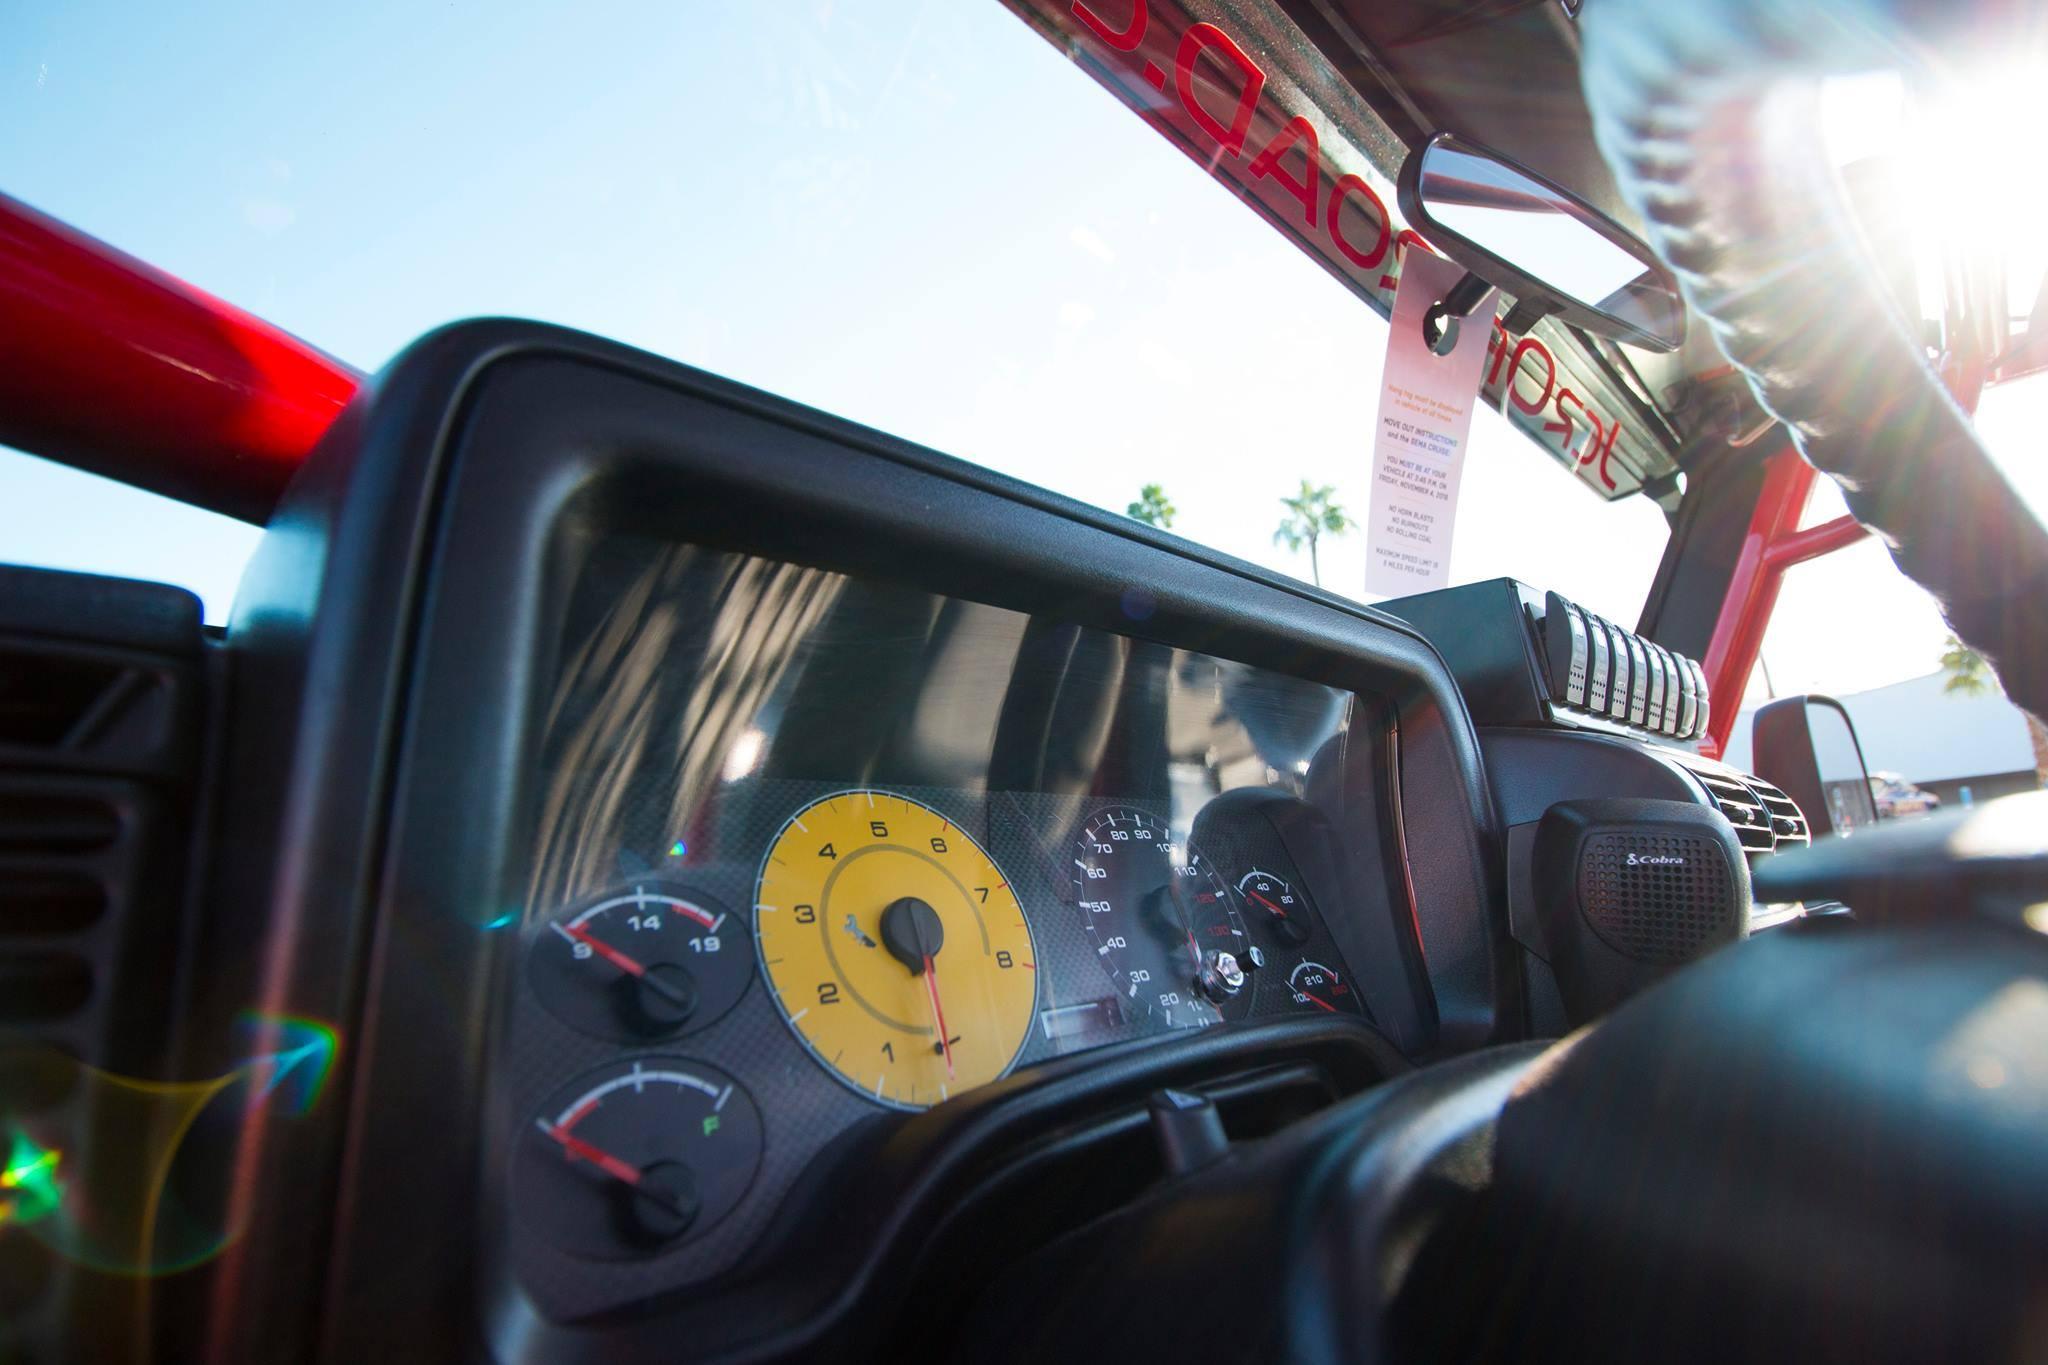 Custom bottom start Ferrari tribute gauges for Ascender 2.0, a JCR Offroad 2005 Jeep LJ